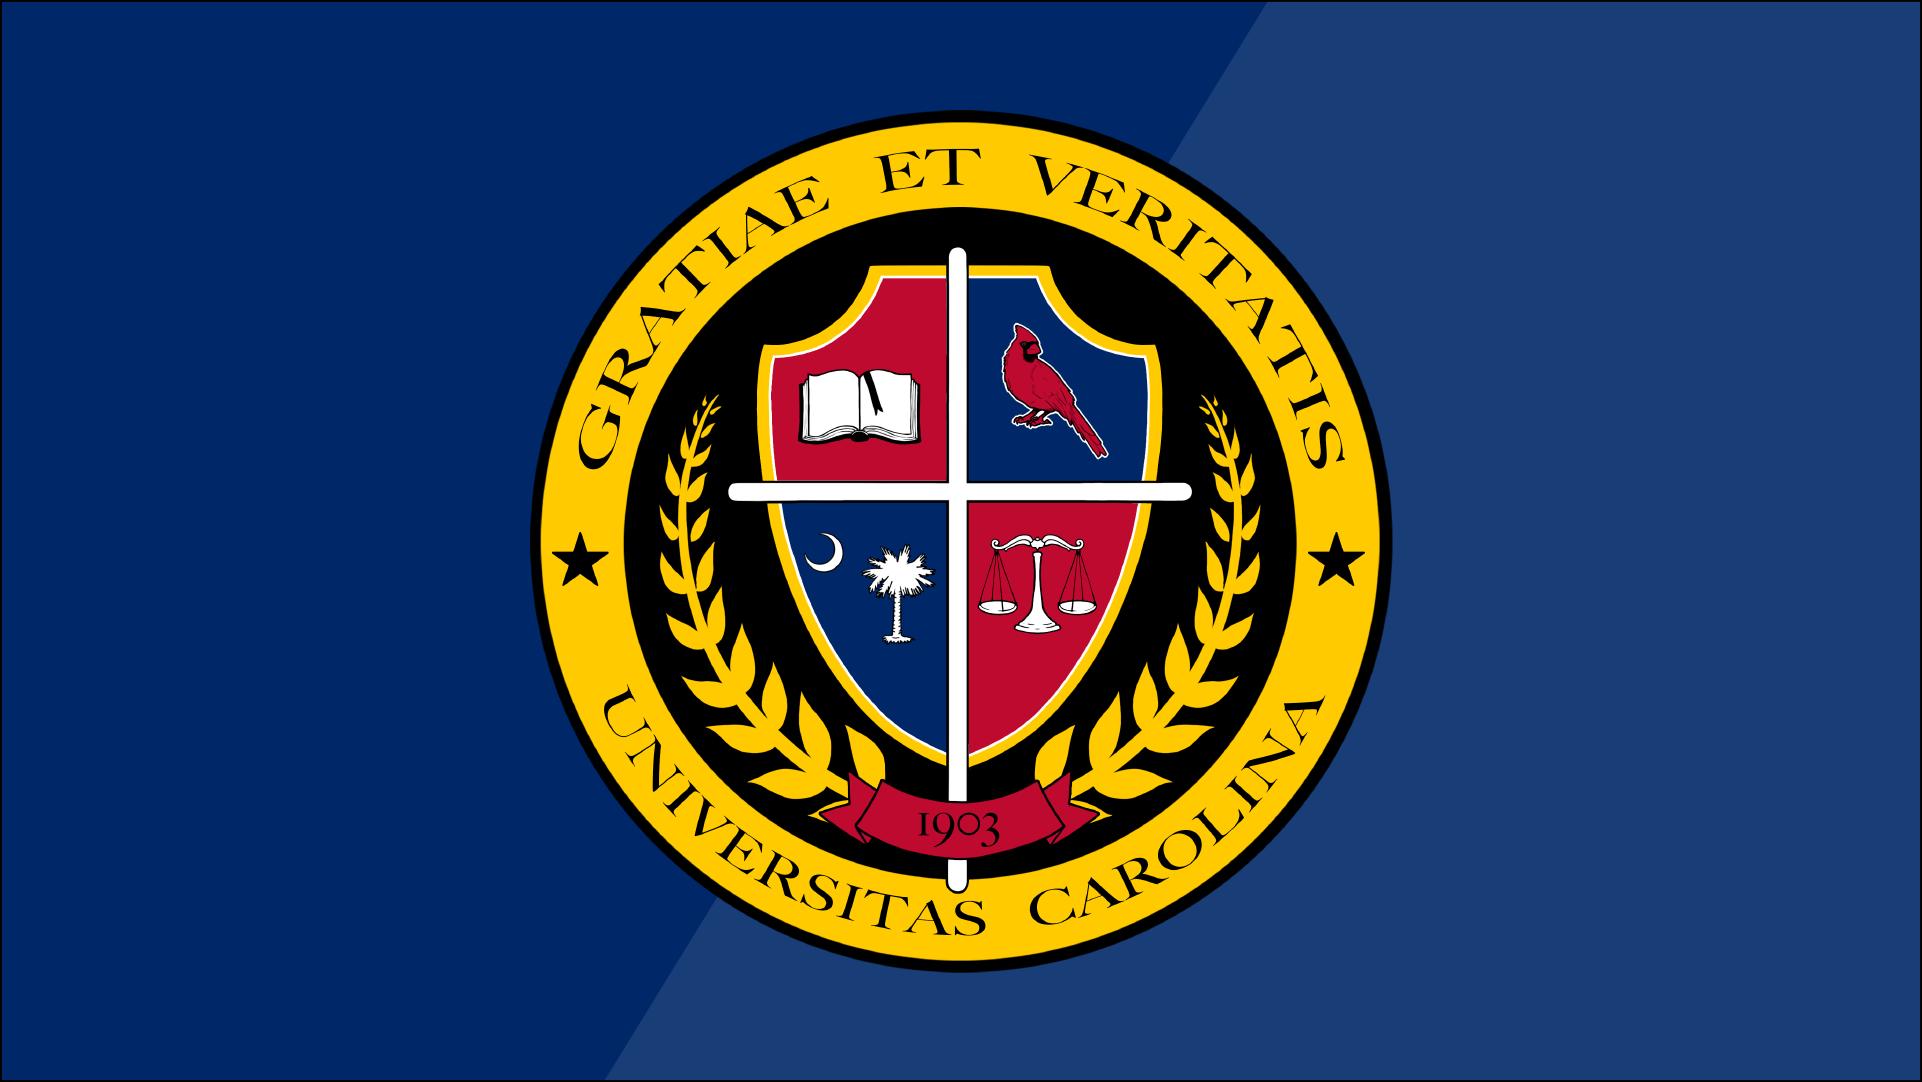 Carolina University Seal